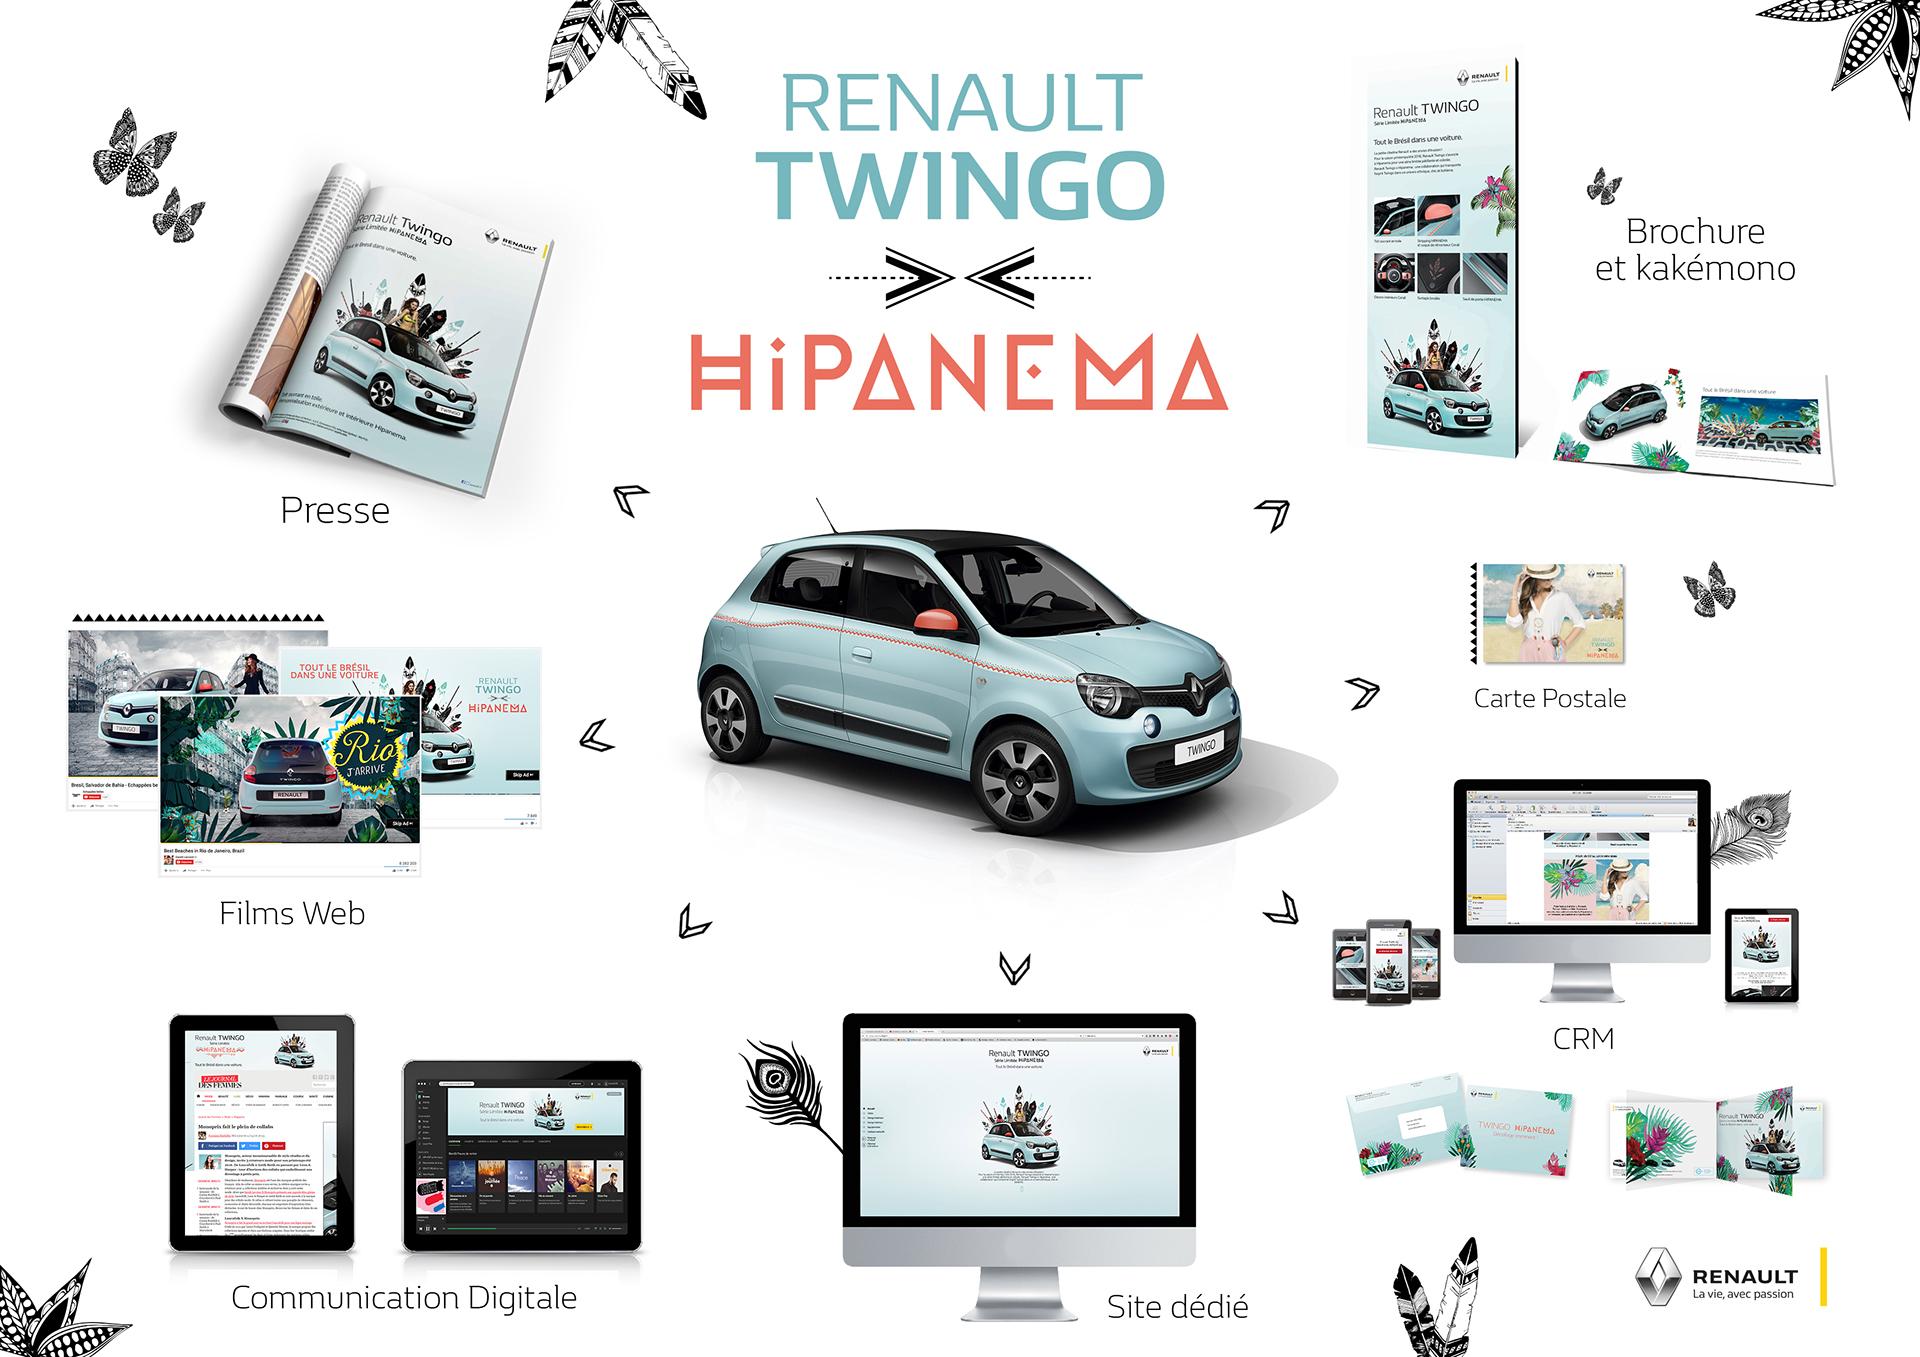 publicite-operation360-renault-hipanema